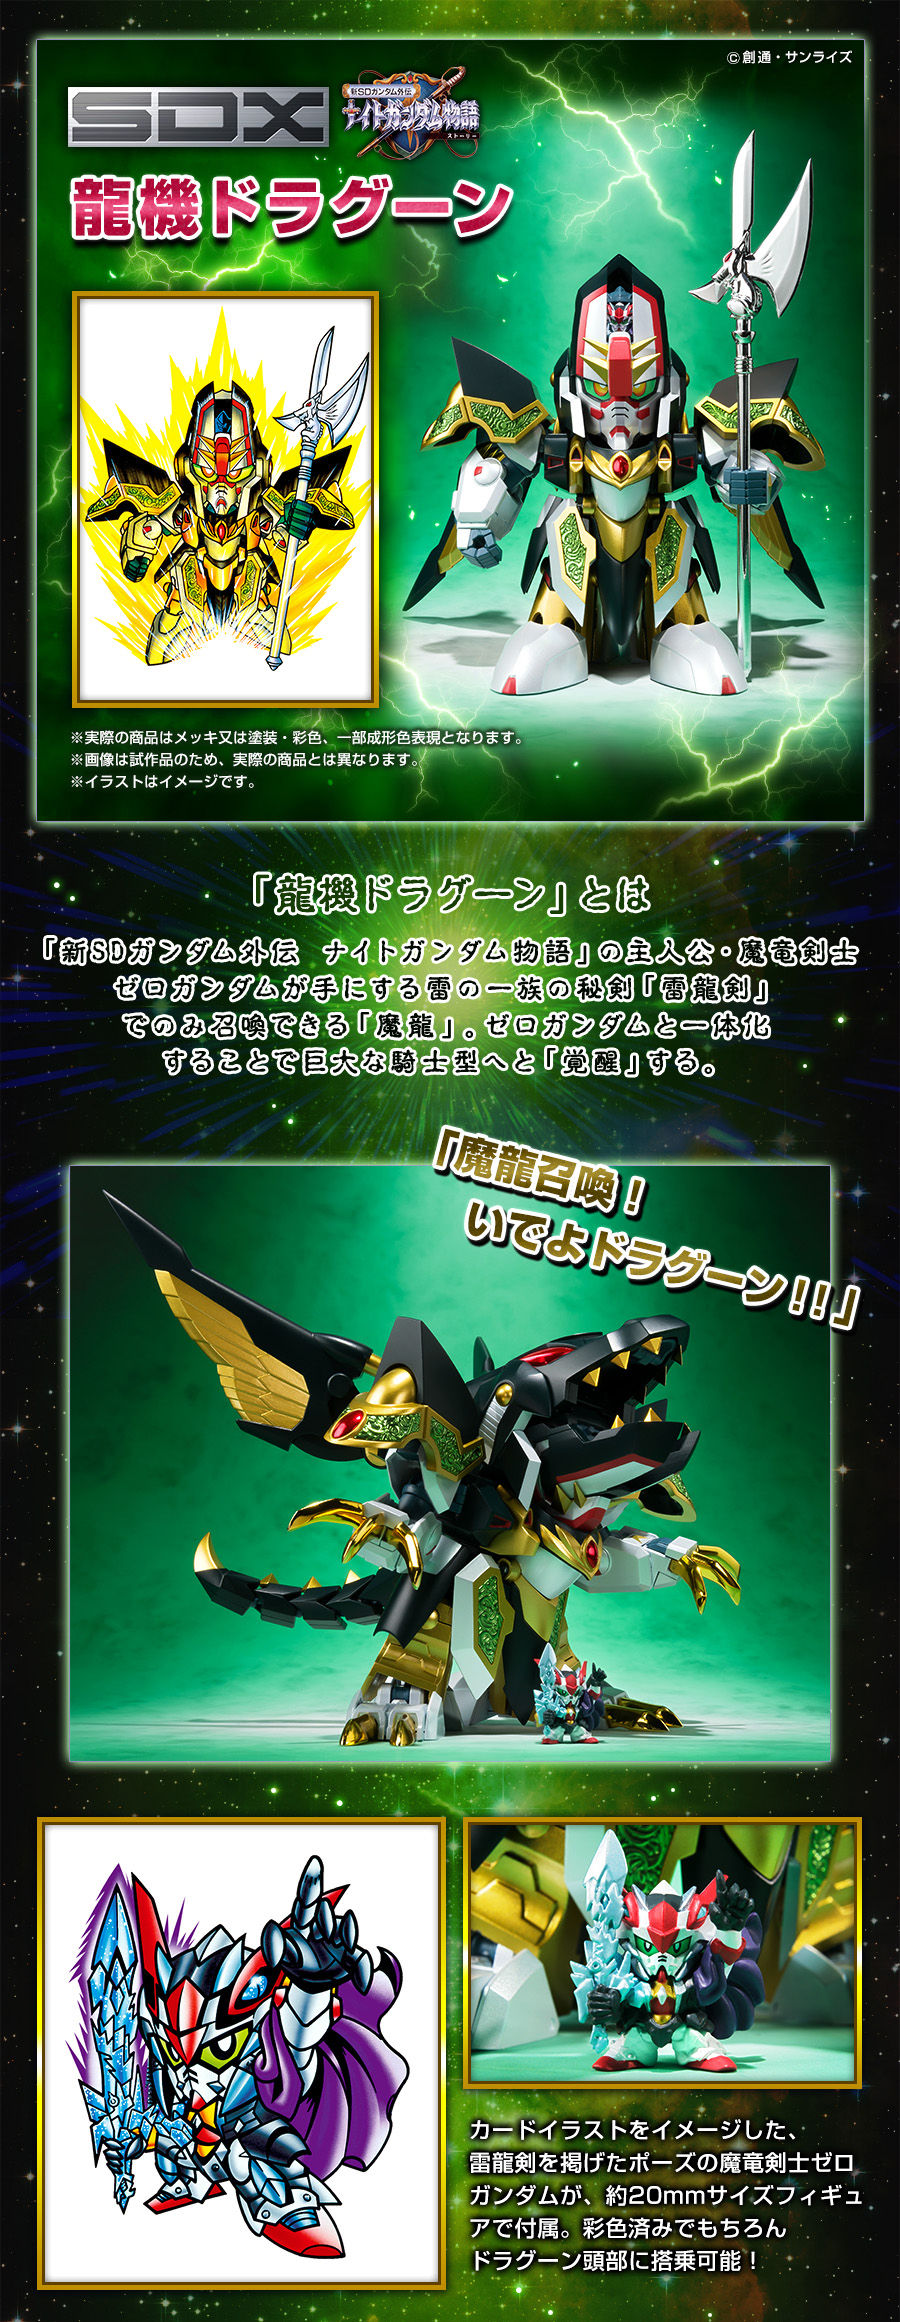 SDX Gundam (Bandai) PjKxt0on_o